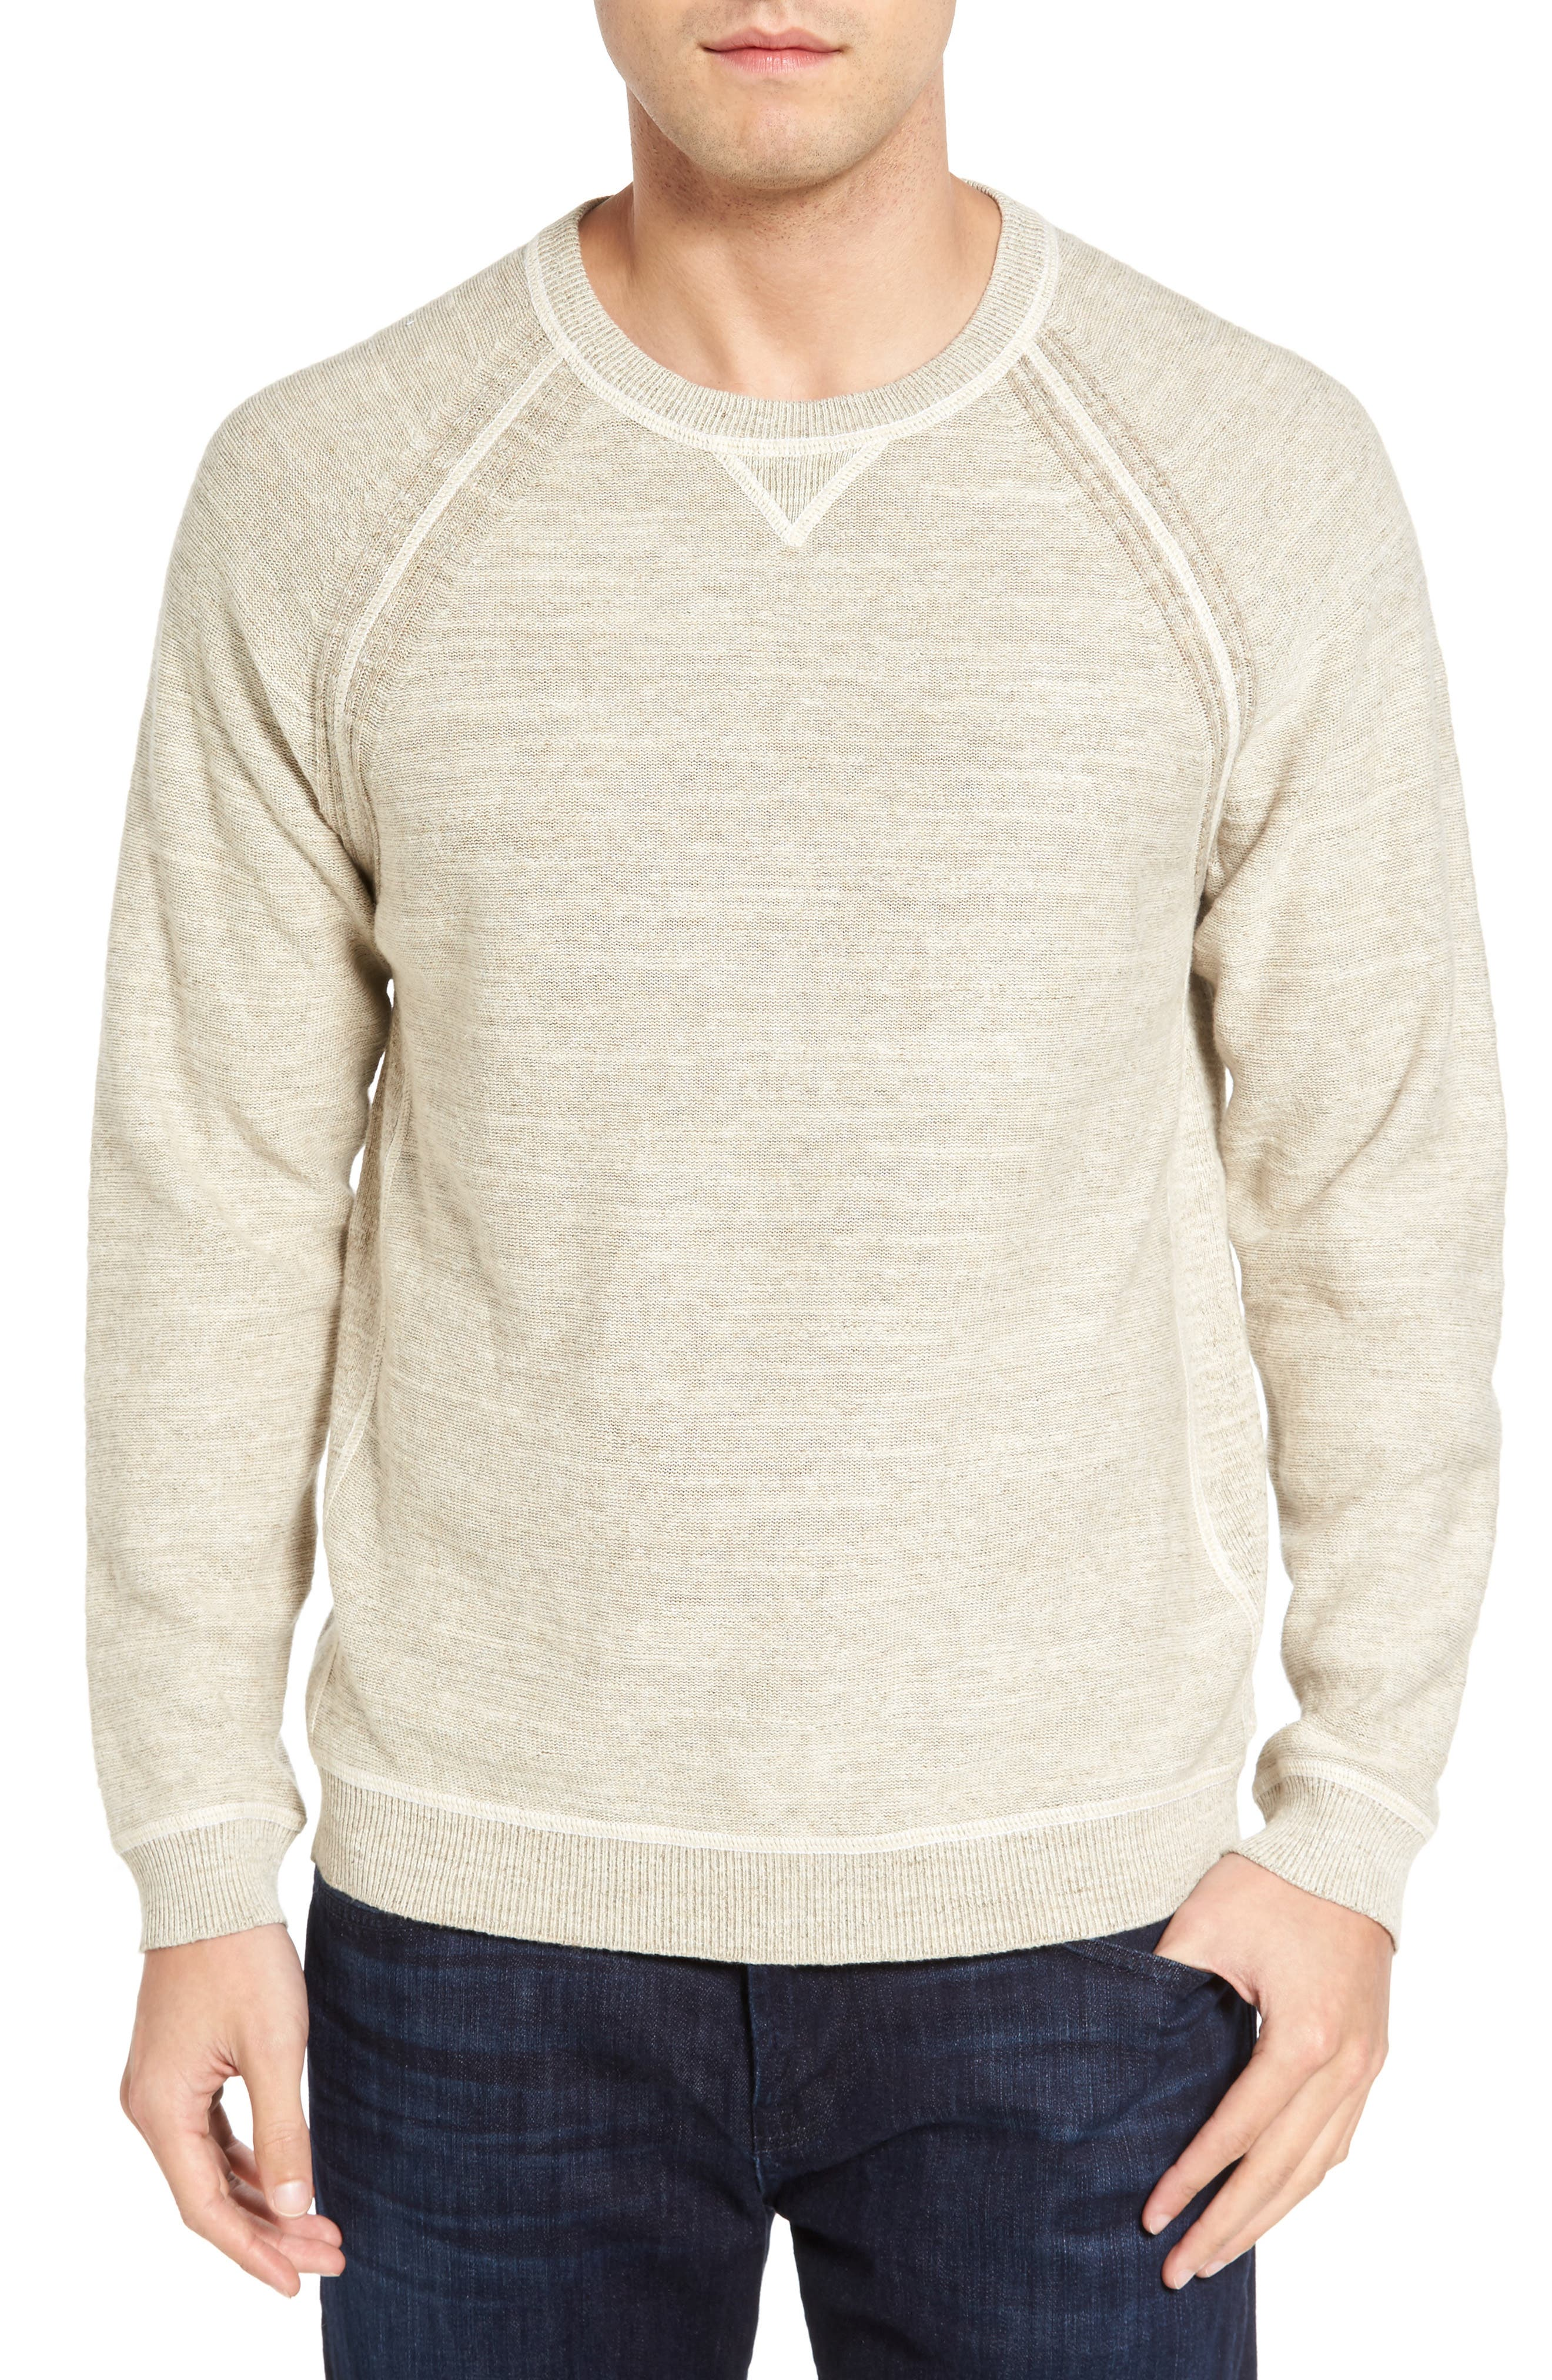 Sandy Bay Reversible Crewneck Sweater,                         Main,                         color, Natural